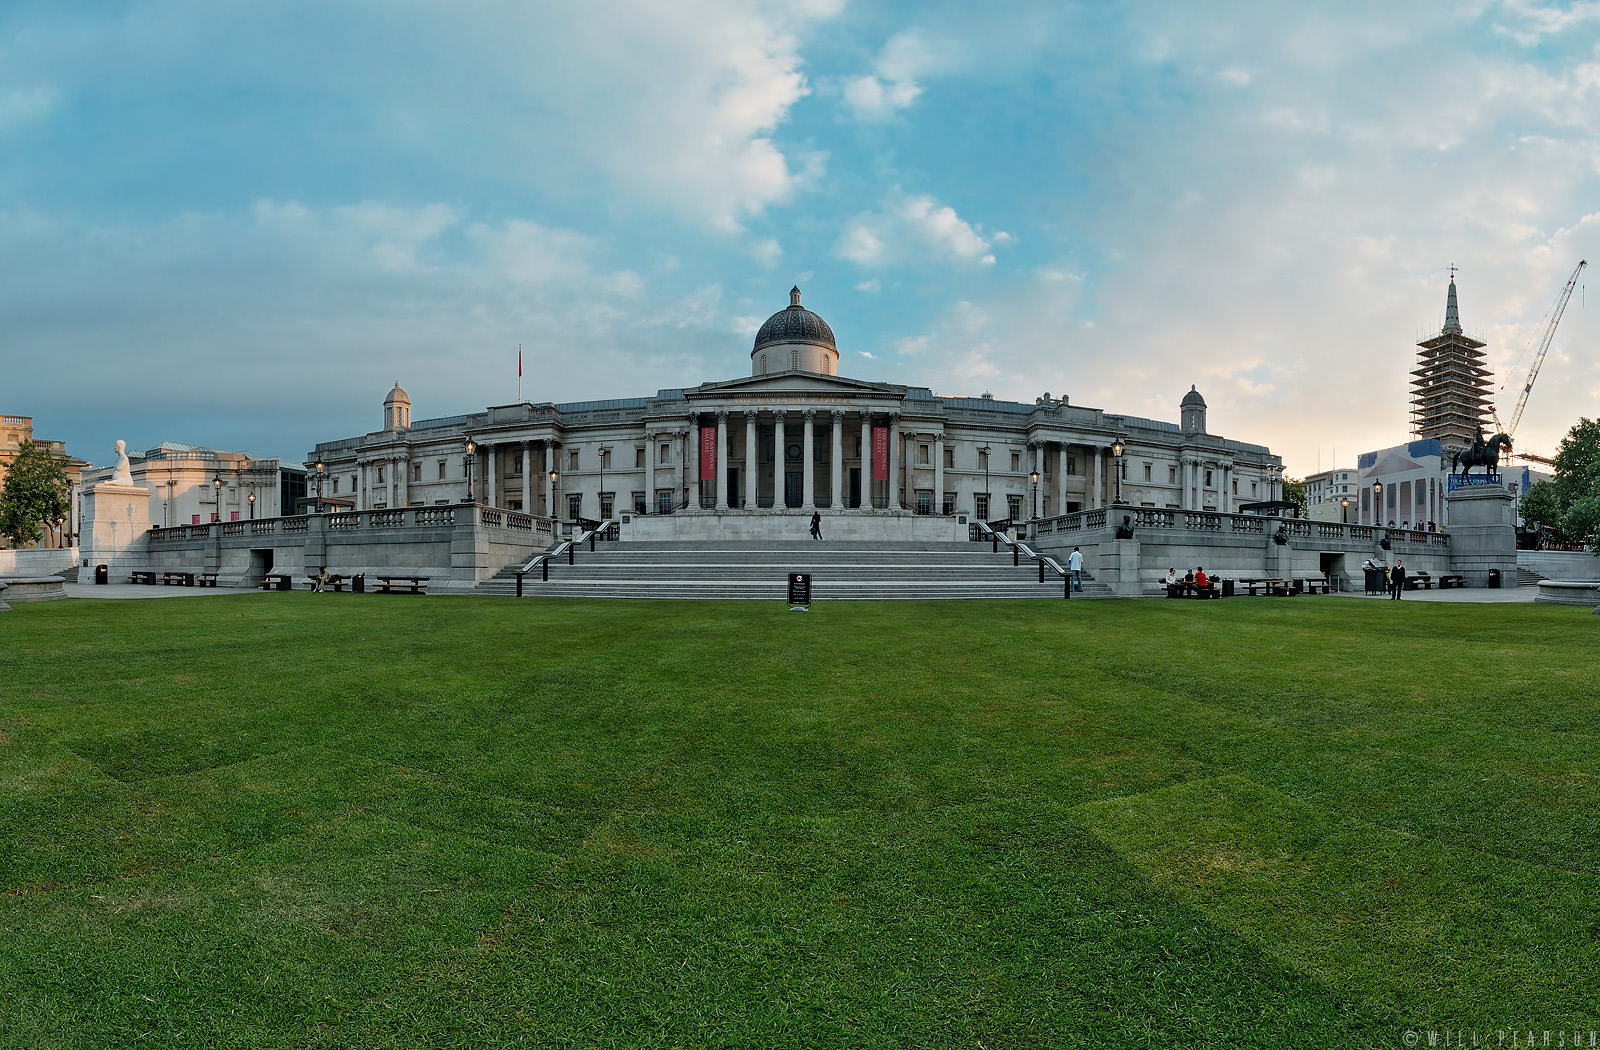 Trafalgar Square with Green Grass!